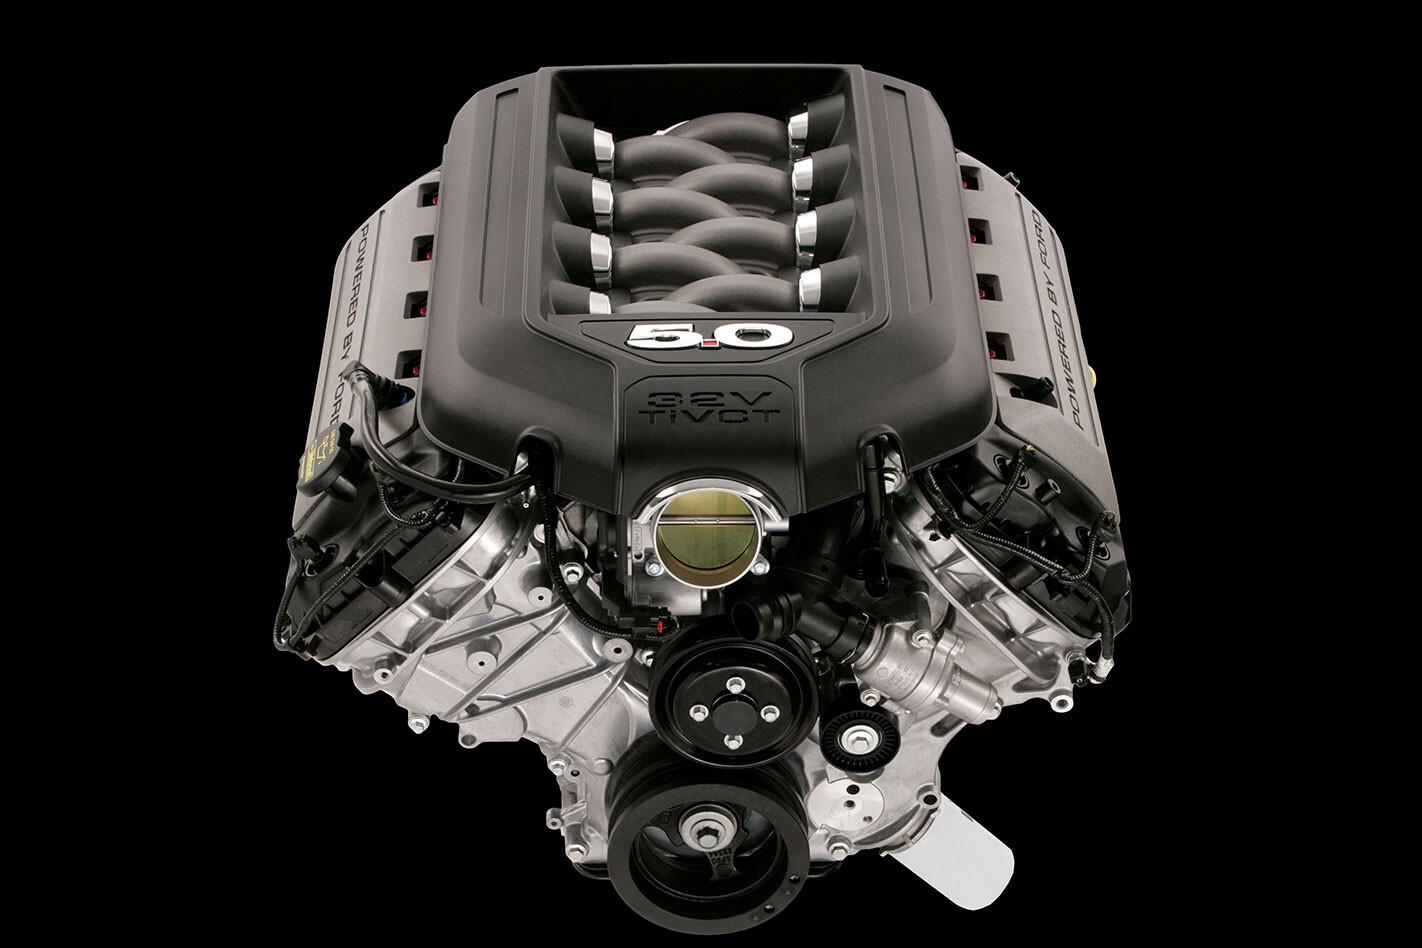 Coyote V8 Supercars